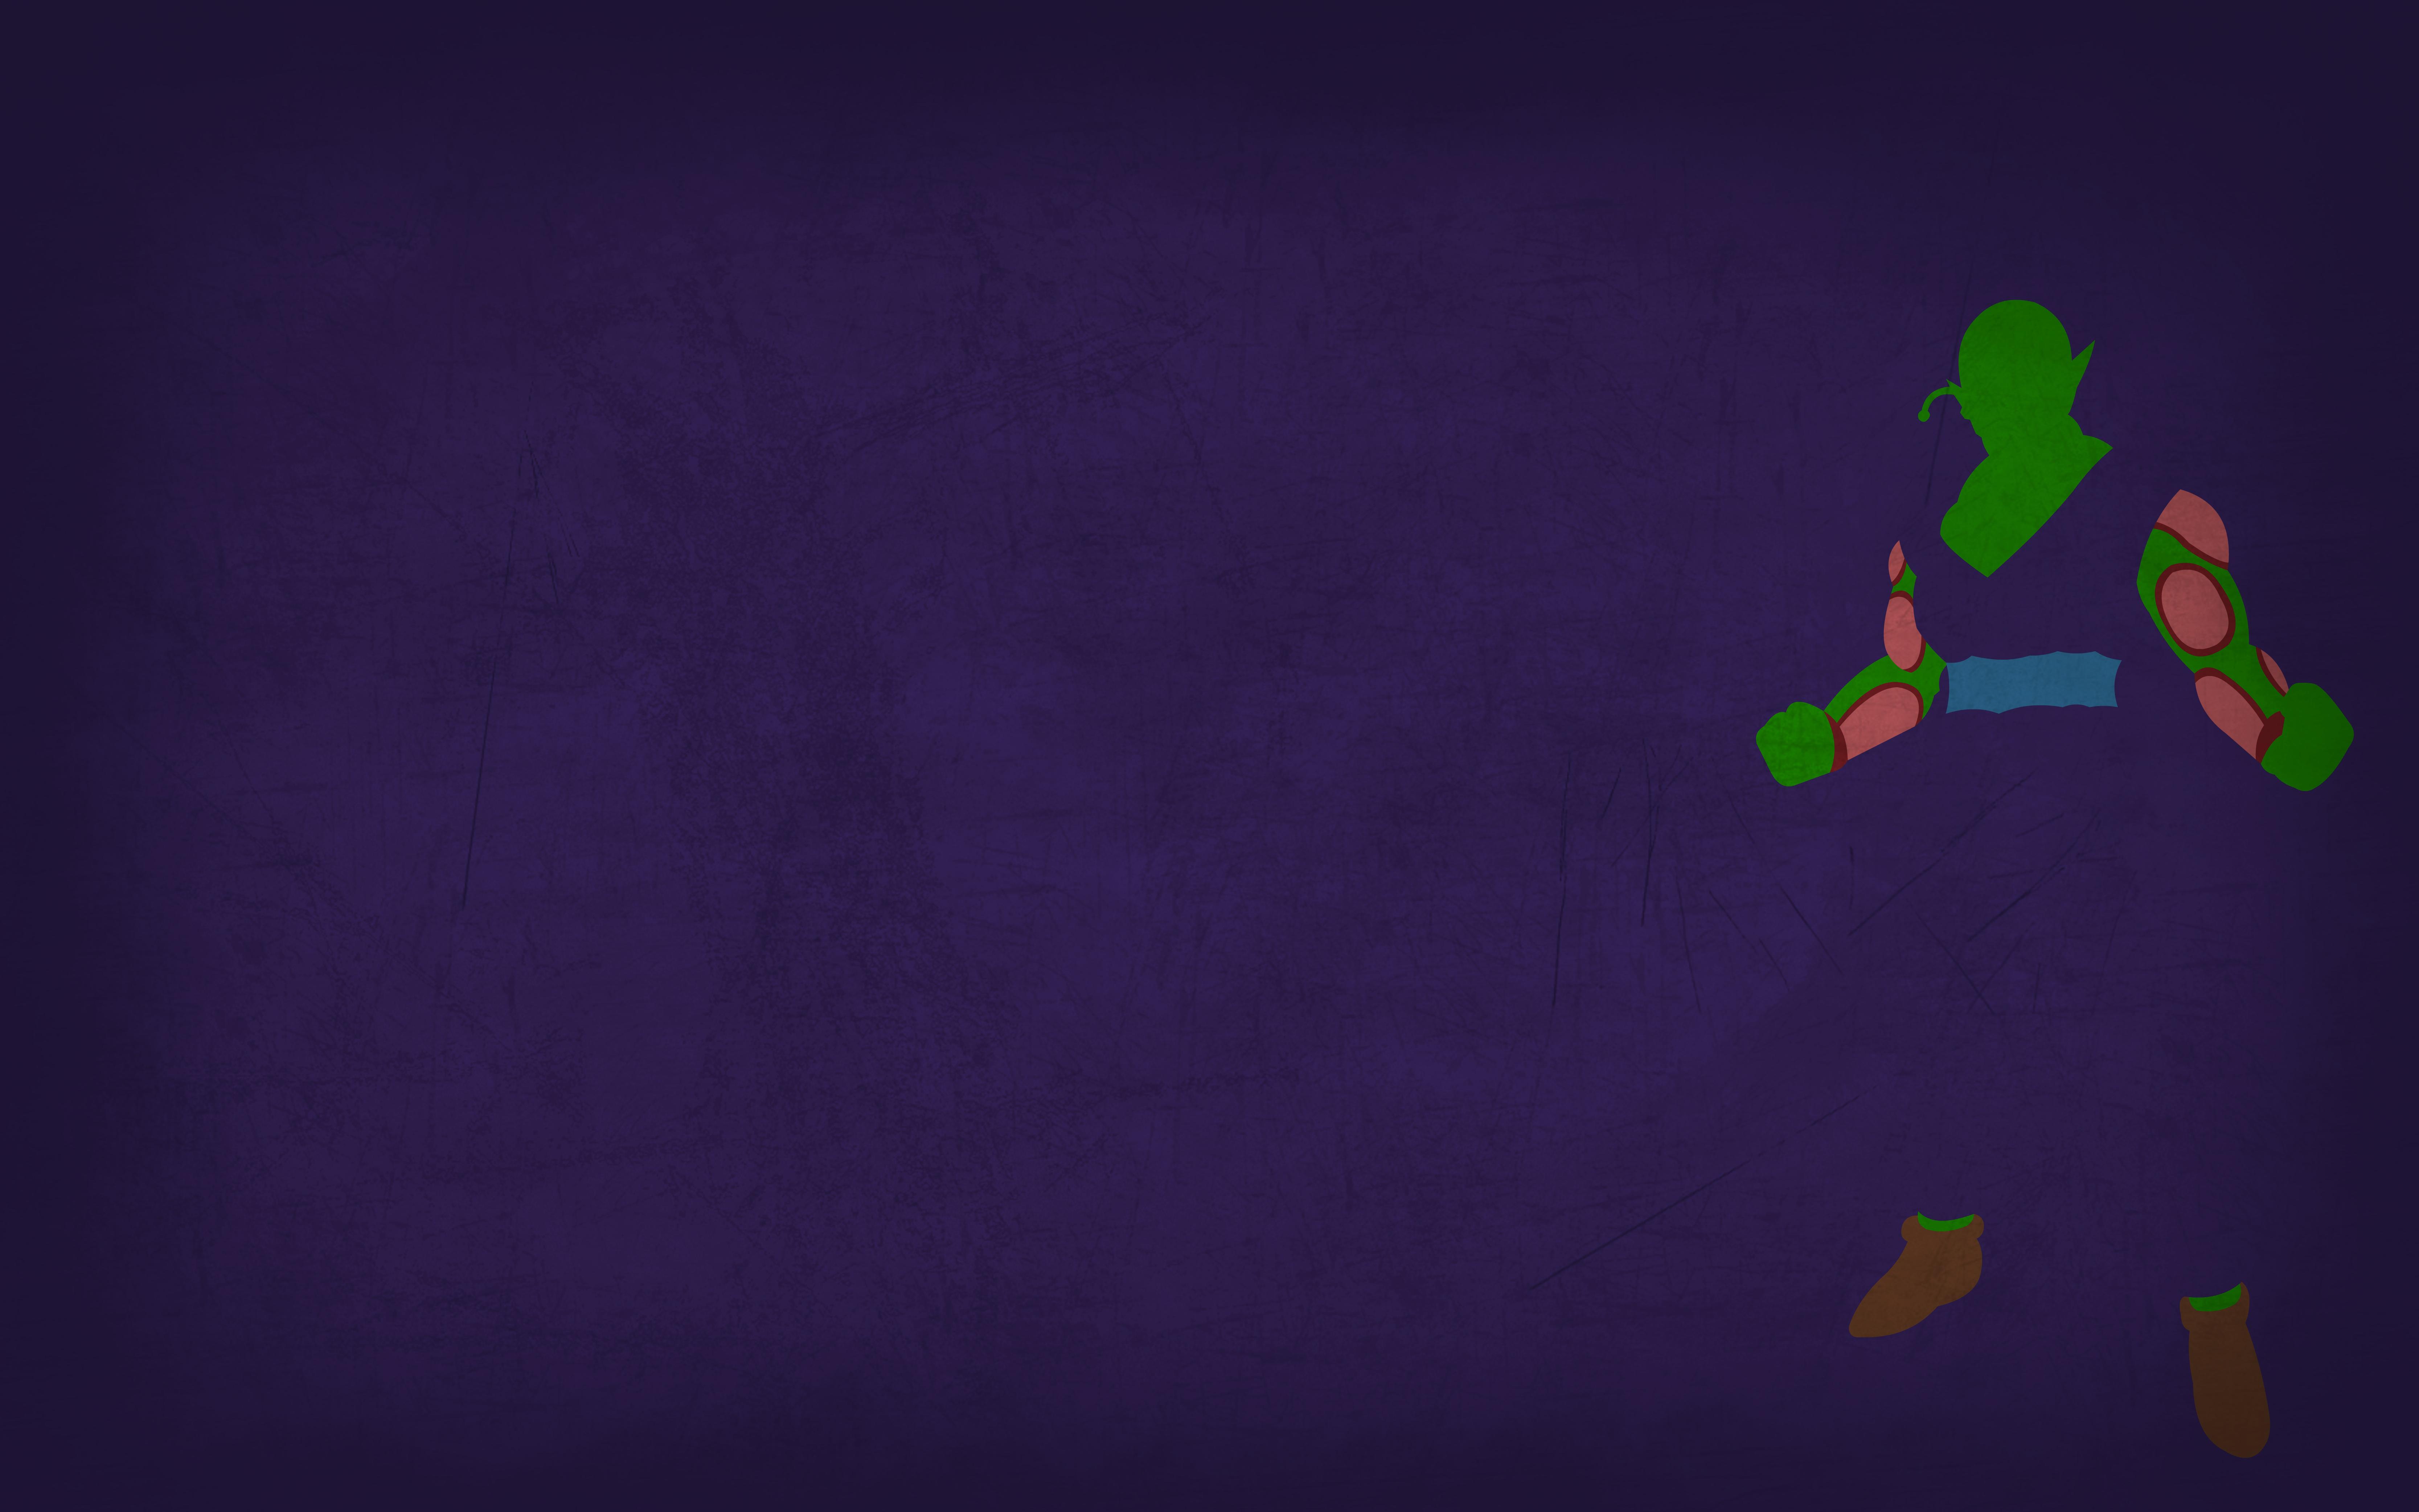 Piccolo 2 By Dragonitearmy